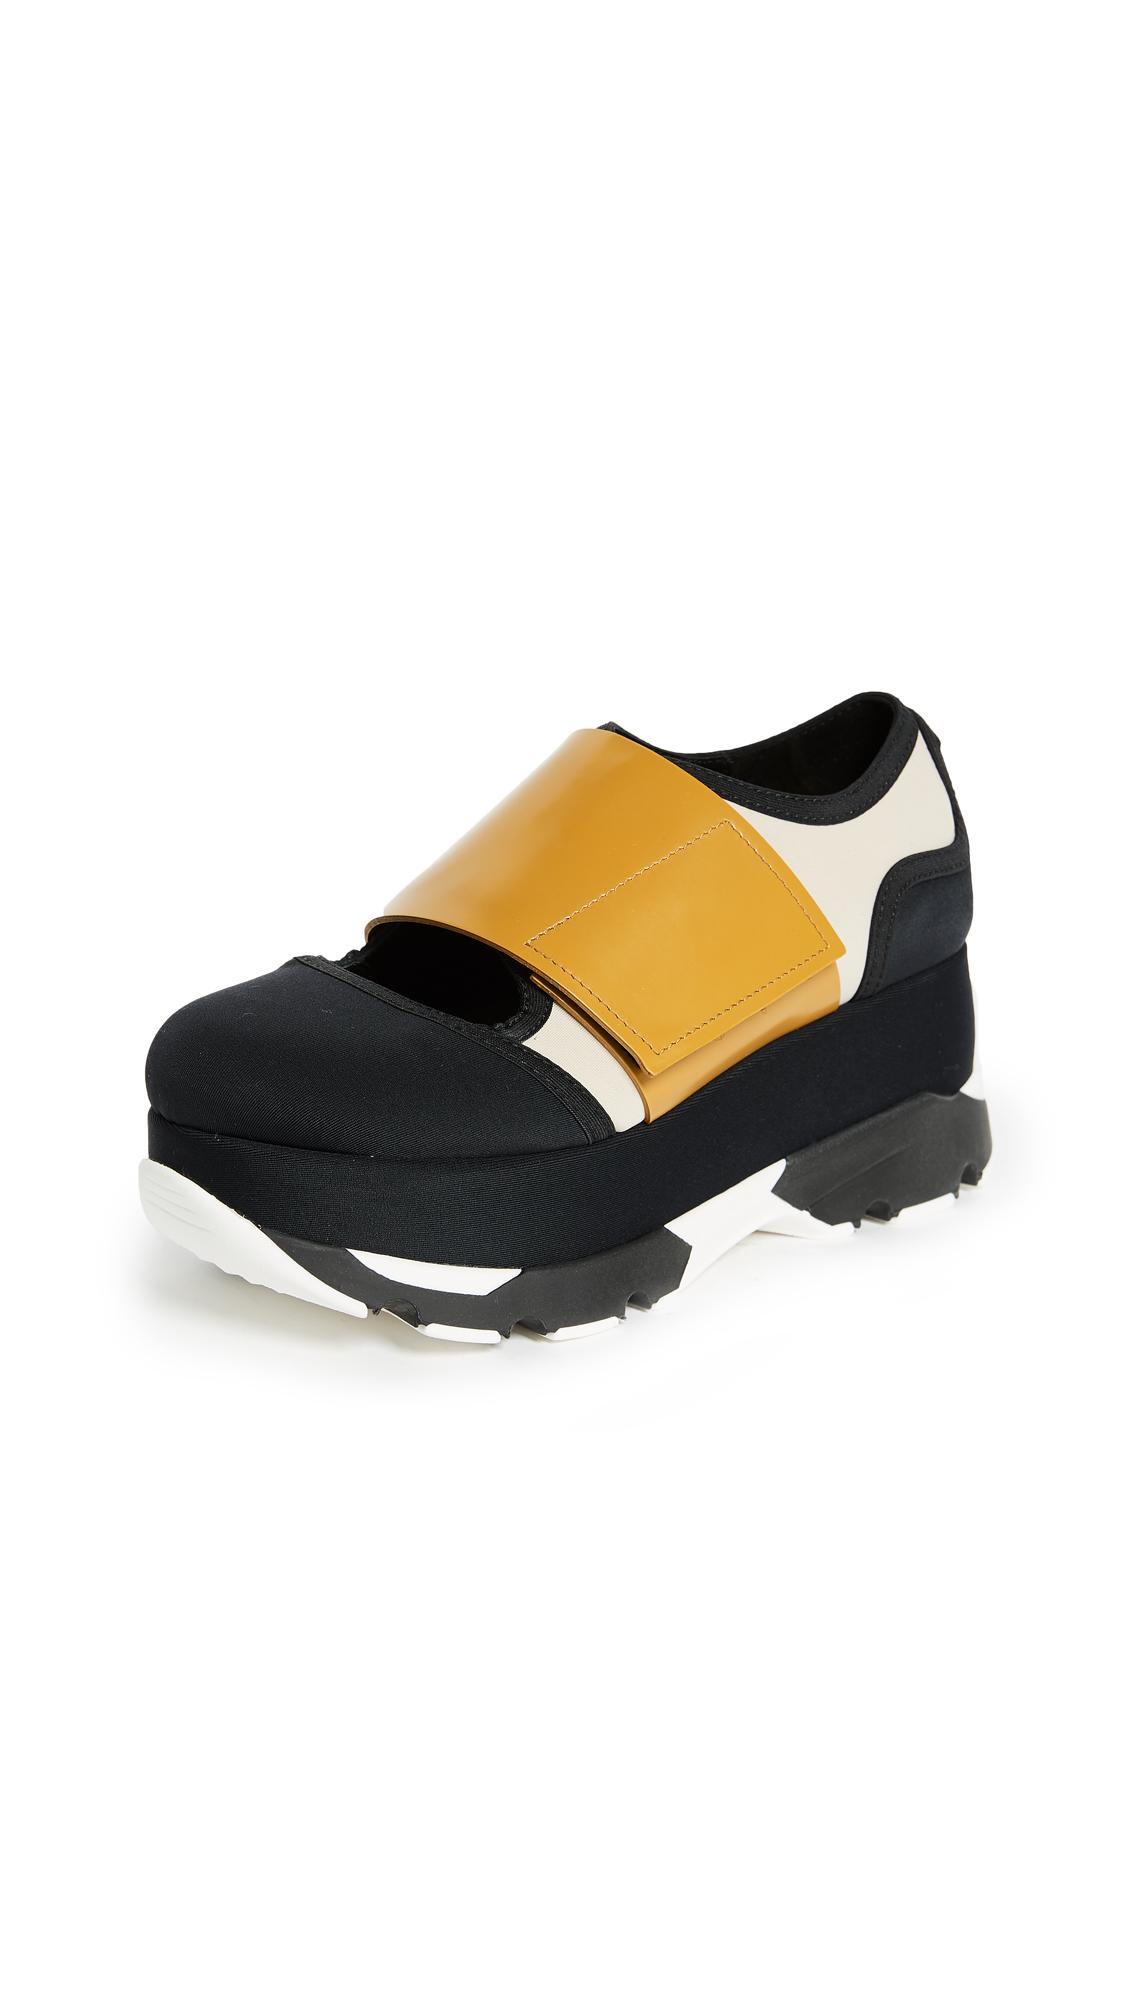 Marni Platform Sneakers - Black/Swan/Ochre